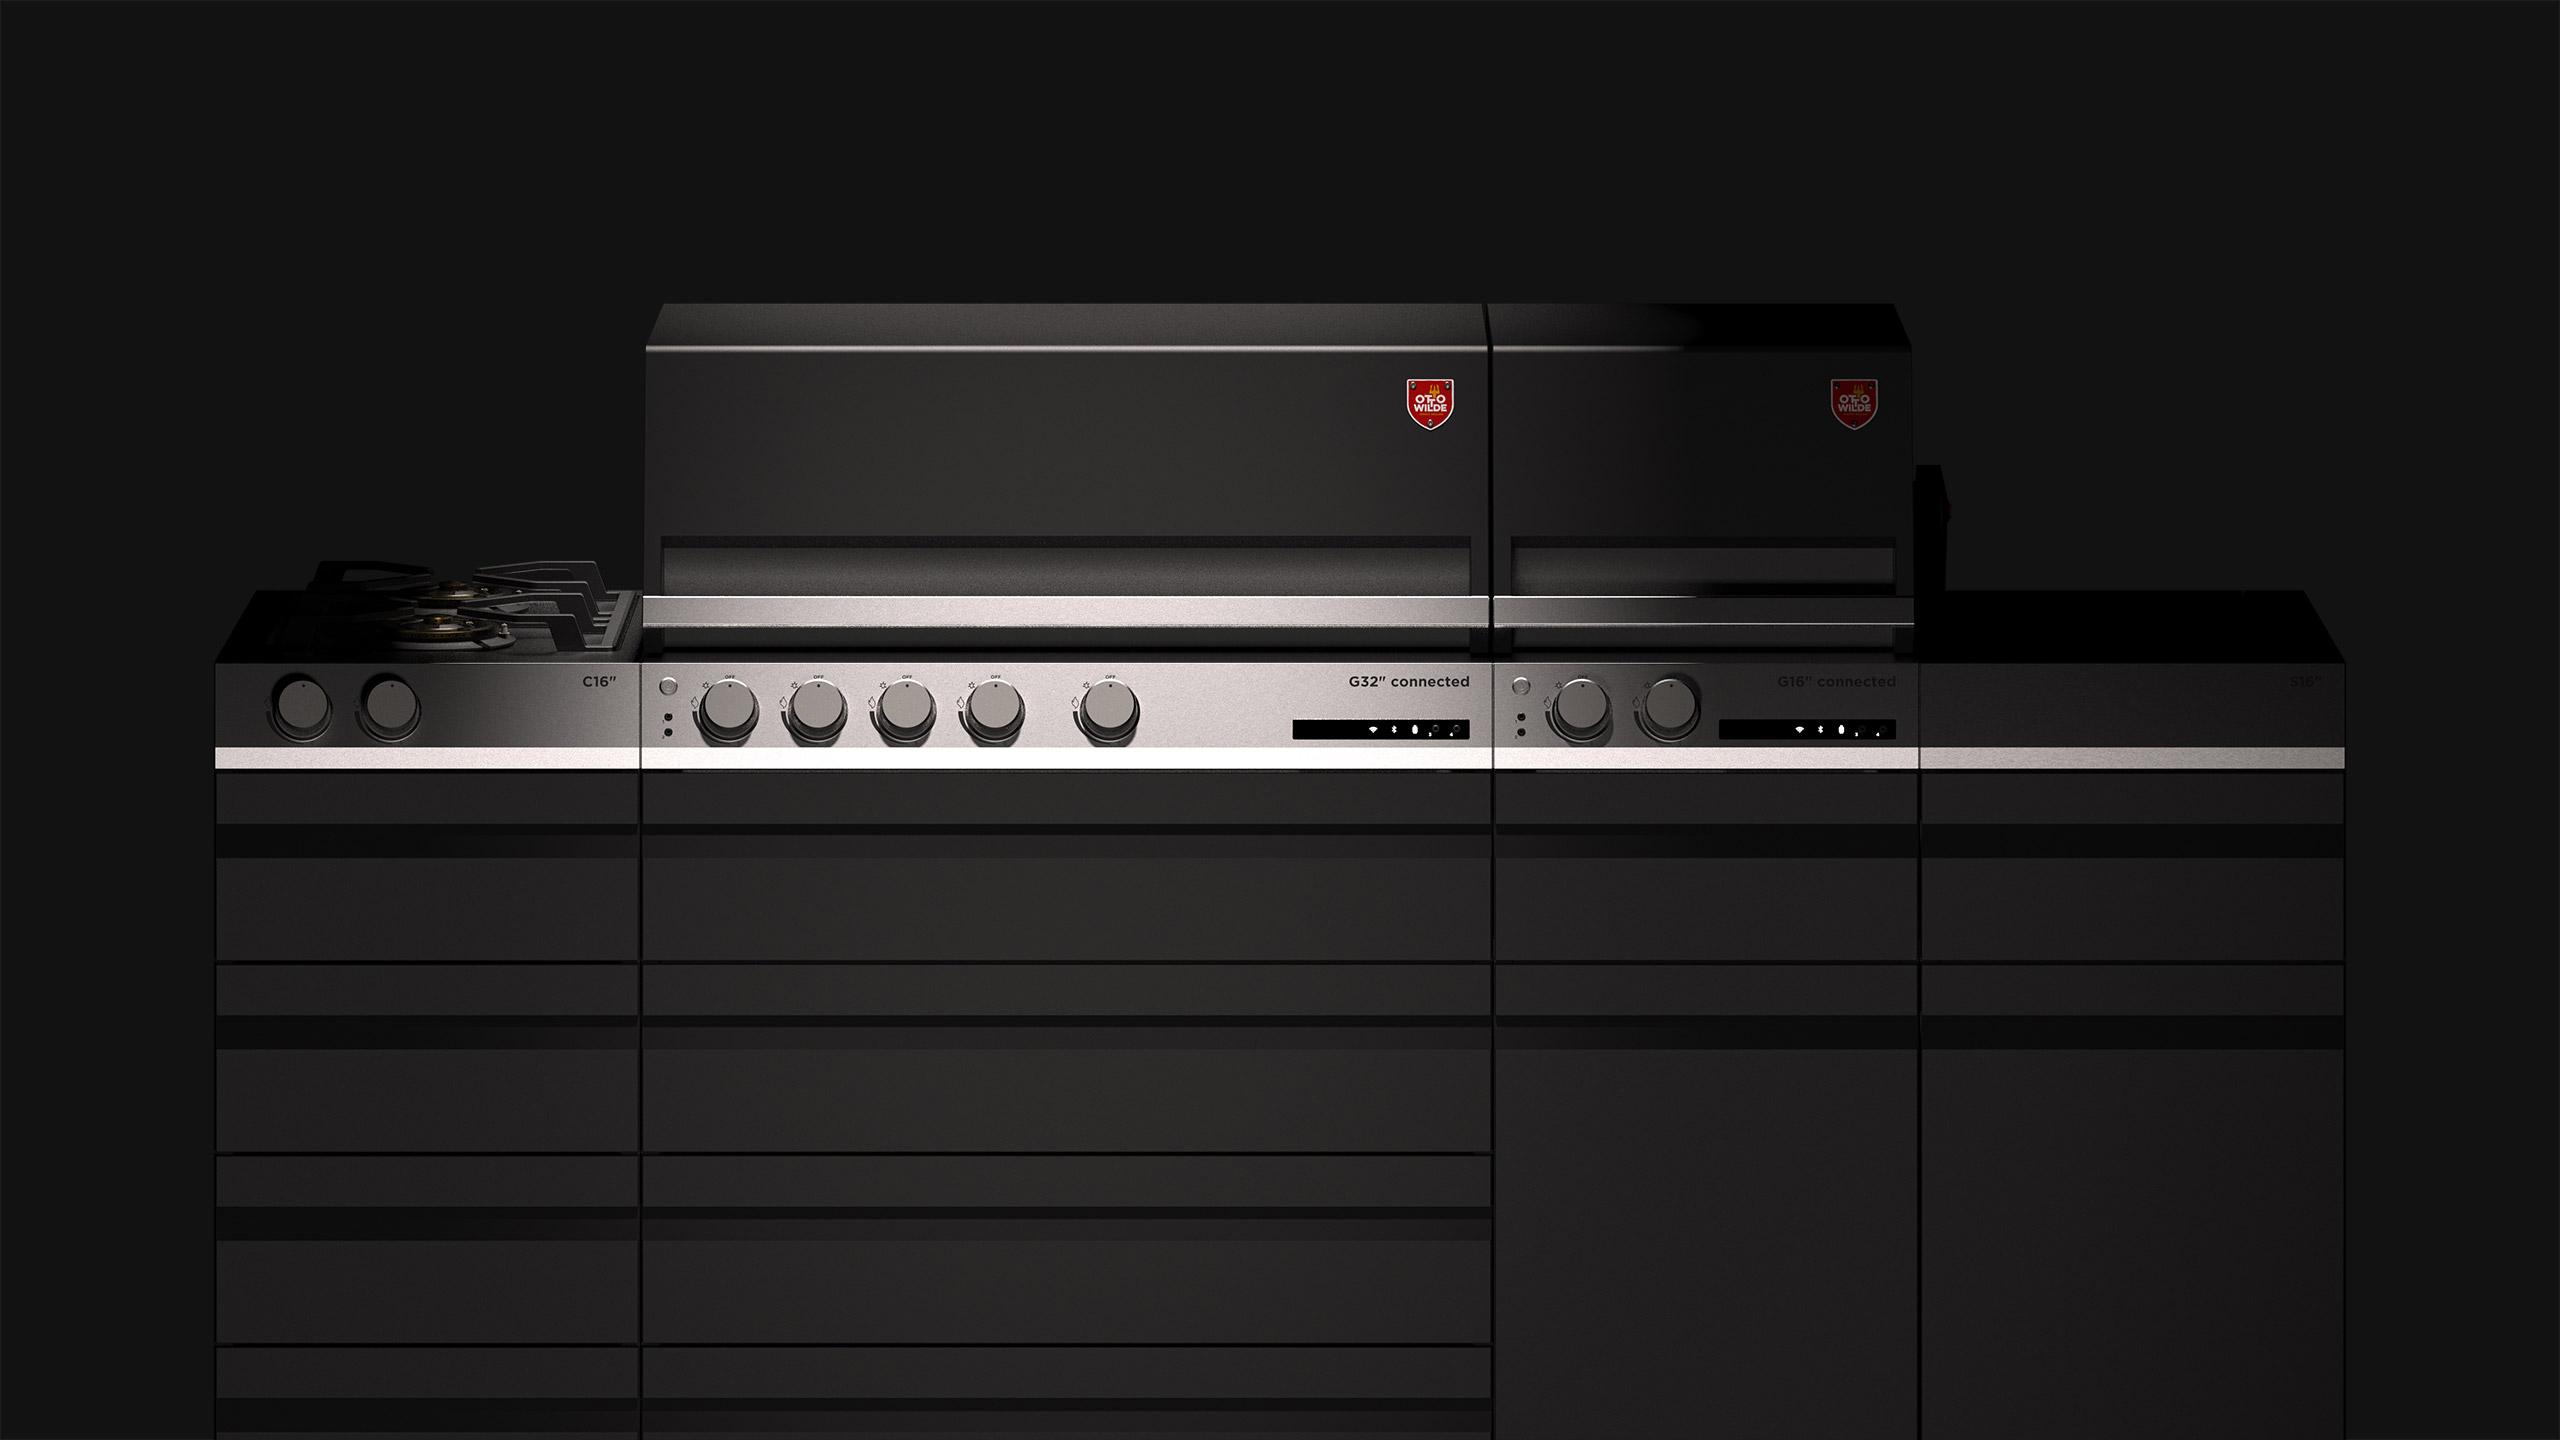 grill_setup